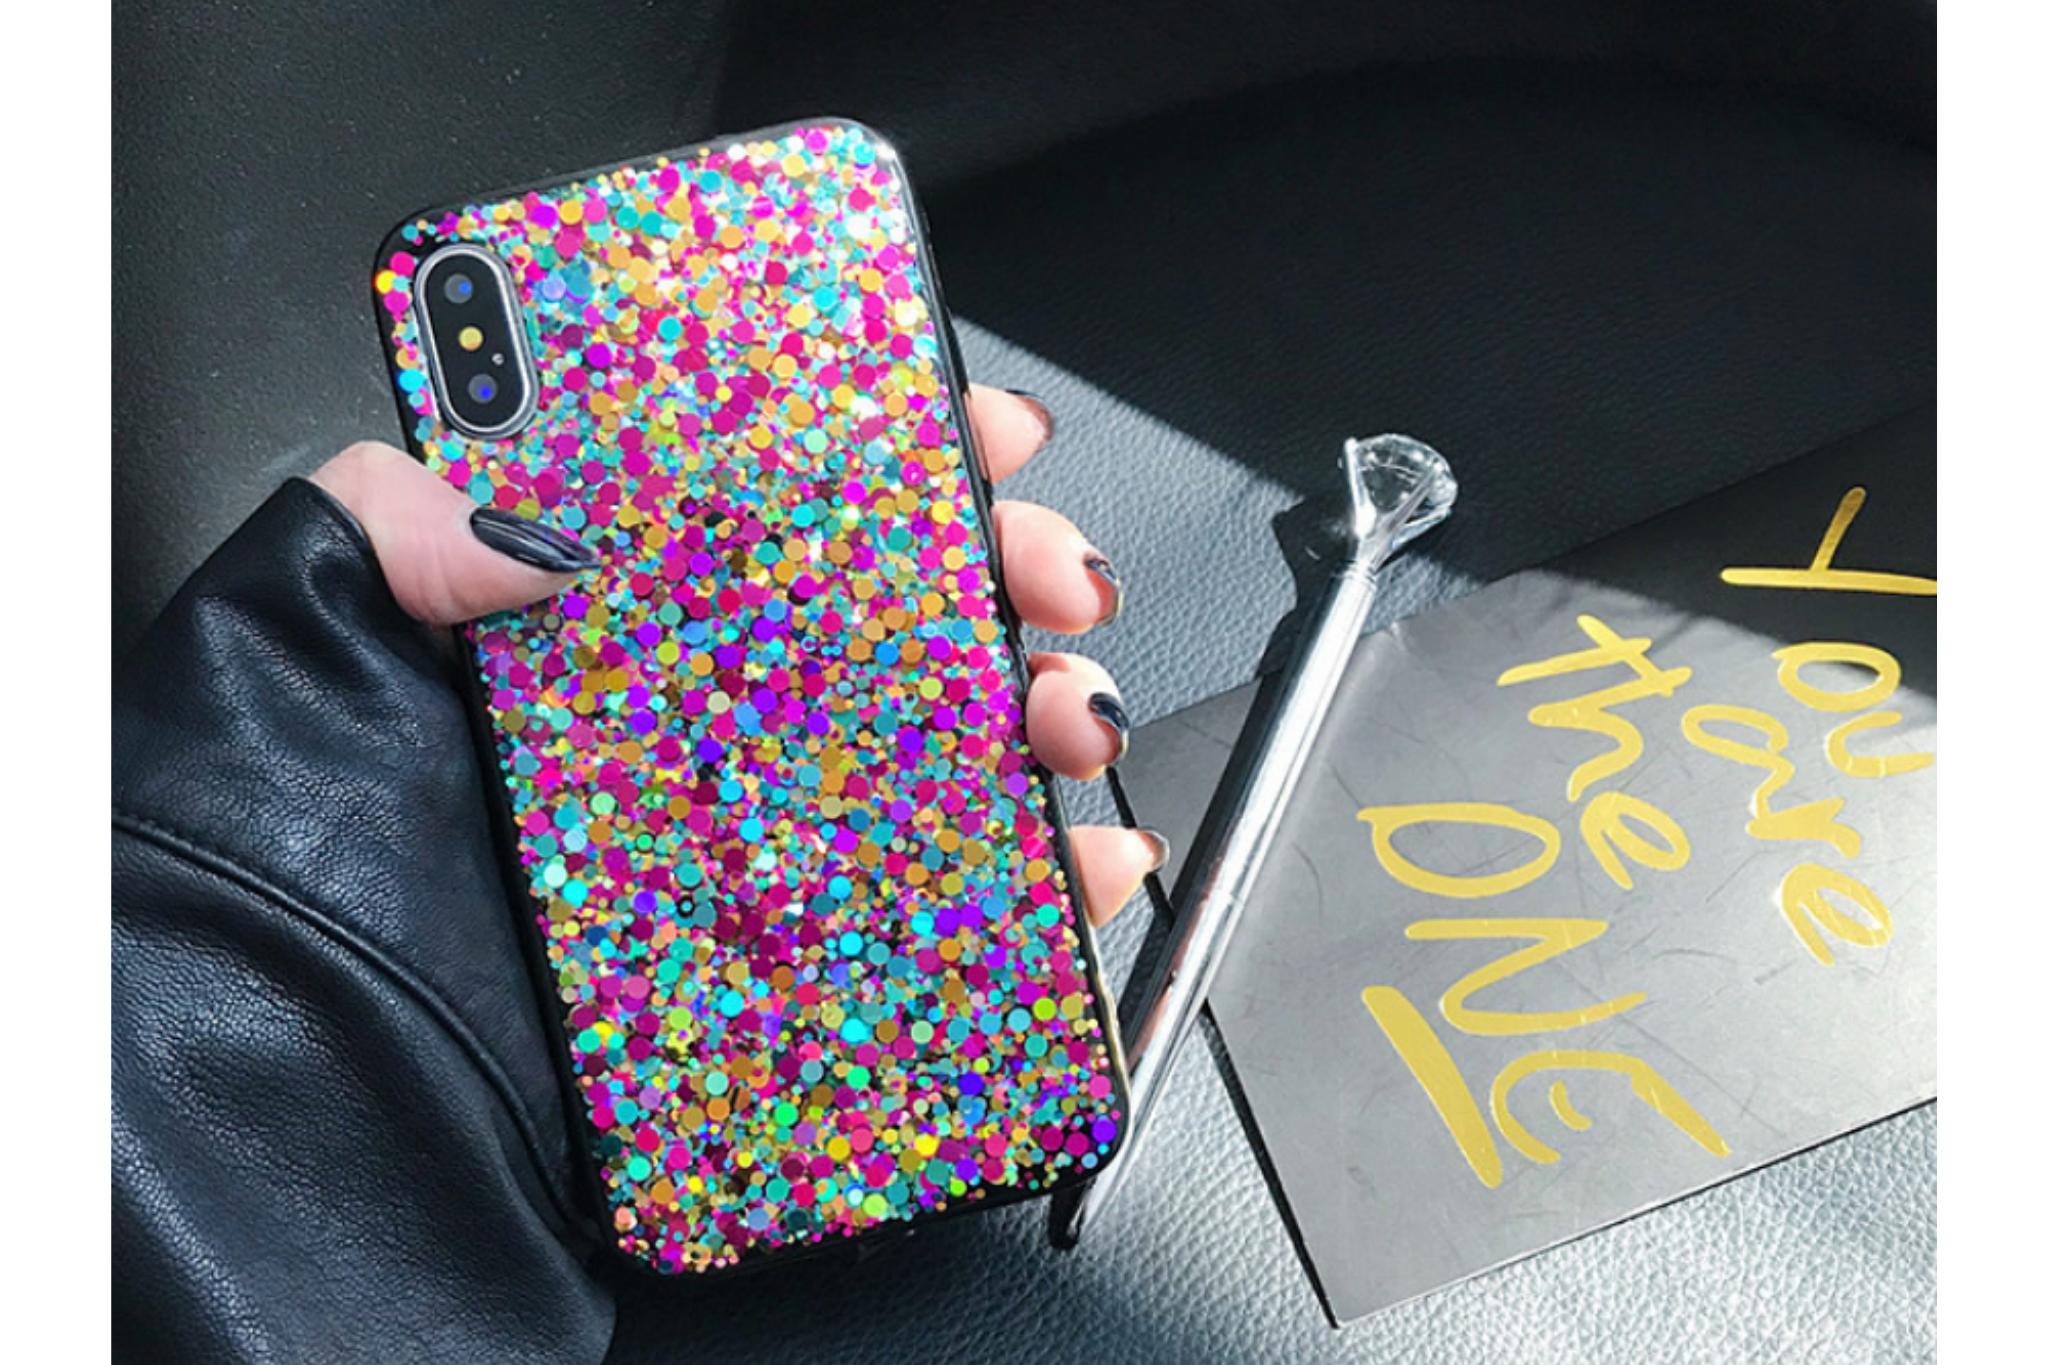 Smartphonehoesje iPhone XR | Bling met glitters | Multicolor